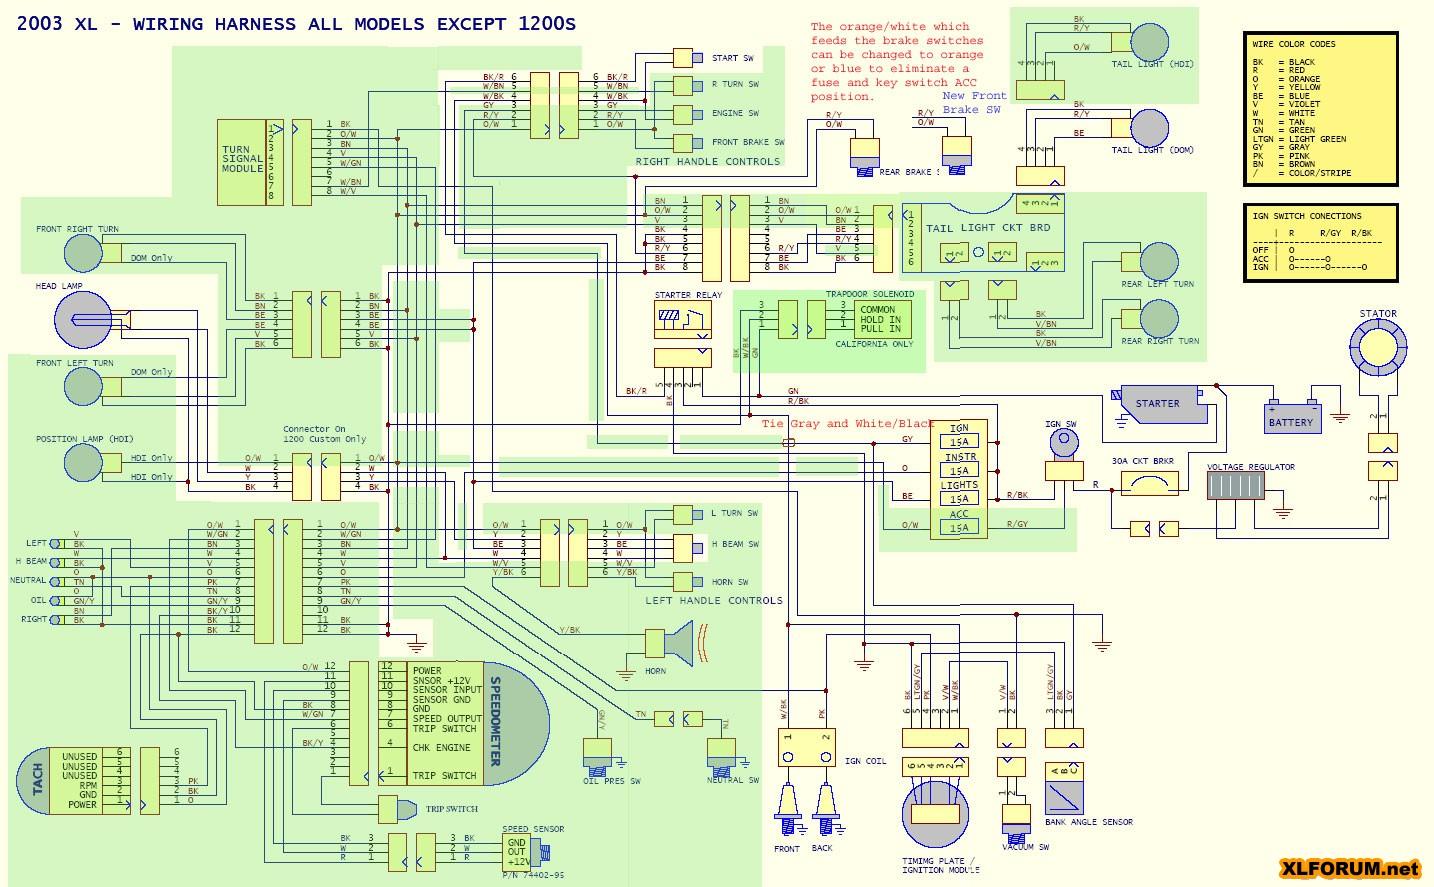 [DIAGRAM_5FD]  Buell S1 Wiring Diagram - 2004 Honda Accord Lx Under Dash Fuse Box for Wiring  Diagram Schematics | Buell Ignition Wiring Diagram |  | Wiring Diagram Schematics